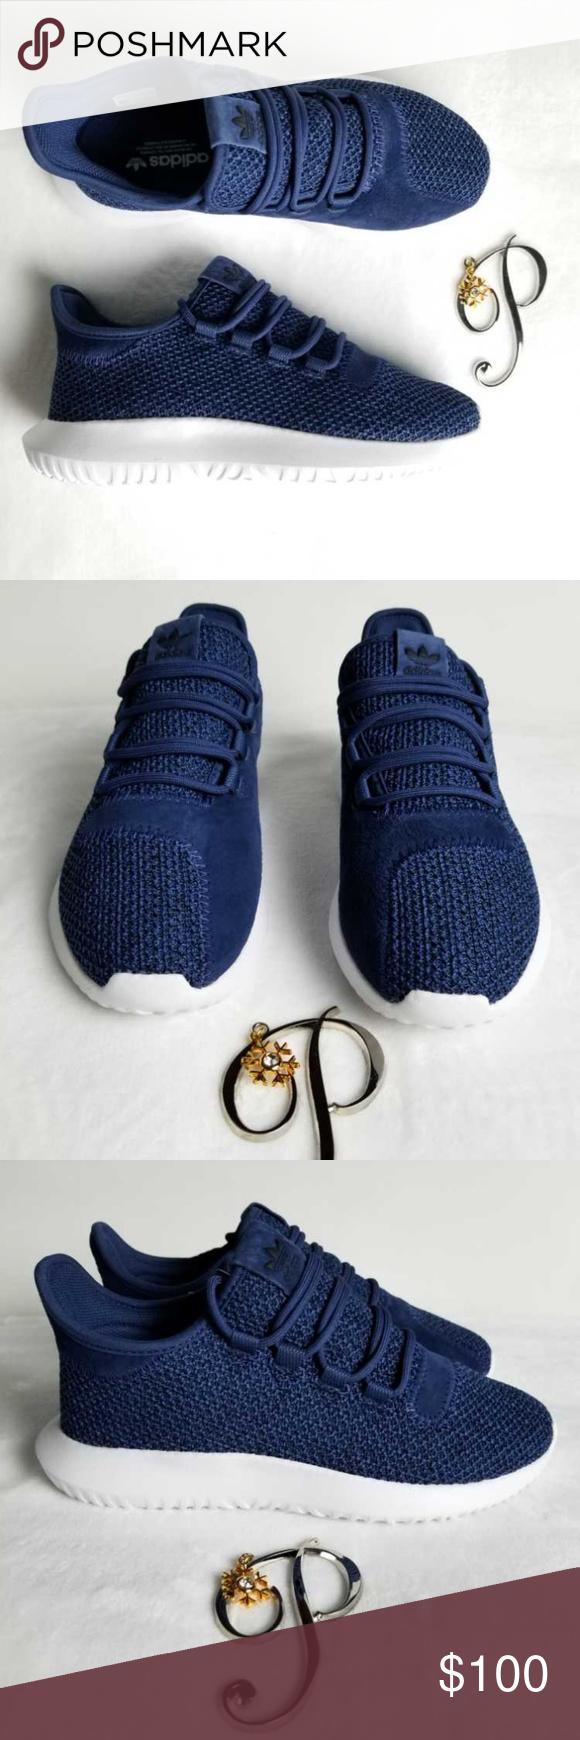 adidas tubulare ombra scarpe nobile indigo dimensioni 7 nwt pinterest